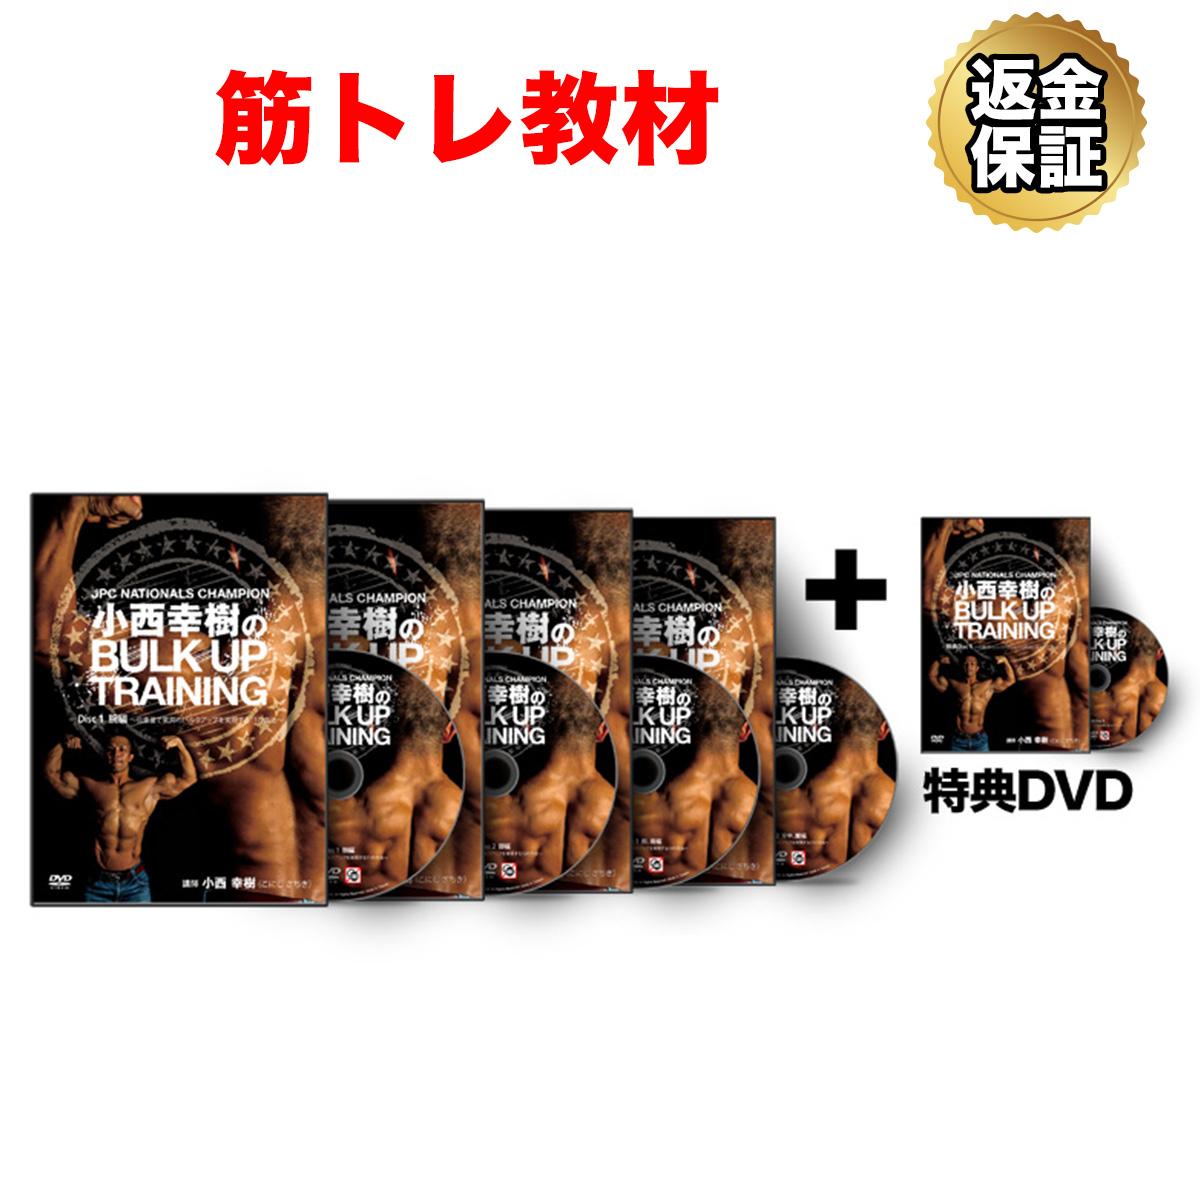 筋トレ 教材 DVD 小西幸樹のBULK UP TRAINING 腕編・脚編・胸&肩編・腹&背中編